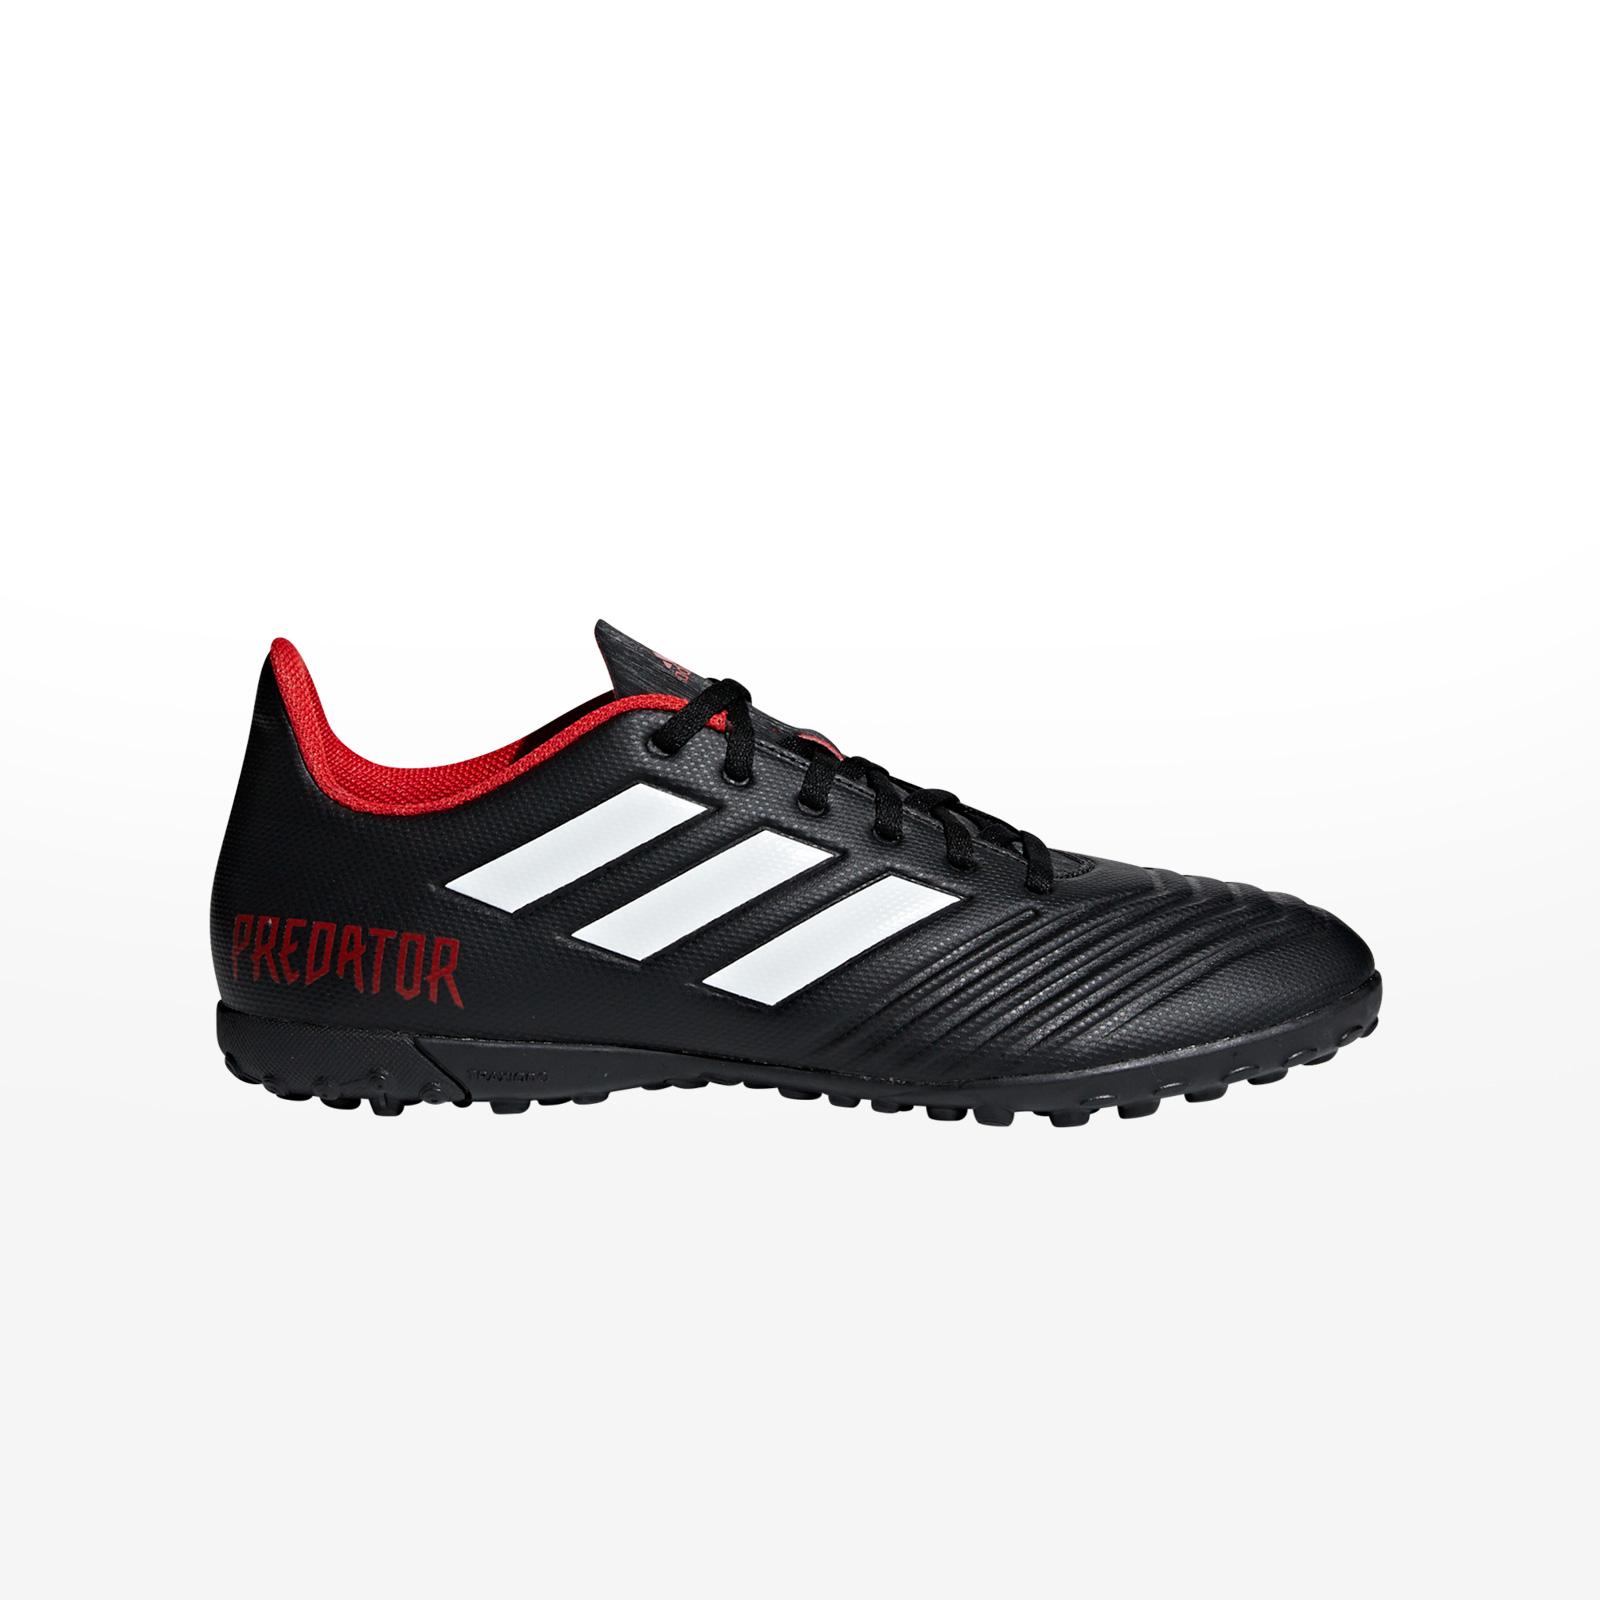 e2c37edc007 -50% Sportcafe adidas – PREDATOR TANGO 18.4 TF – CBLACK/FTWWHT/RED